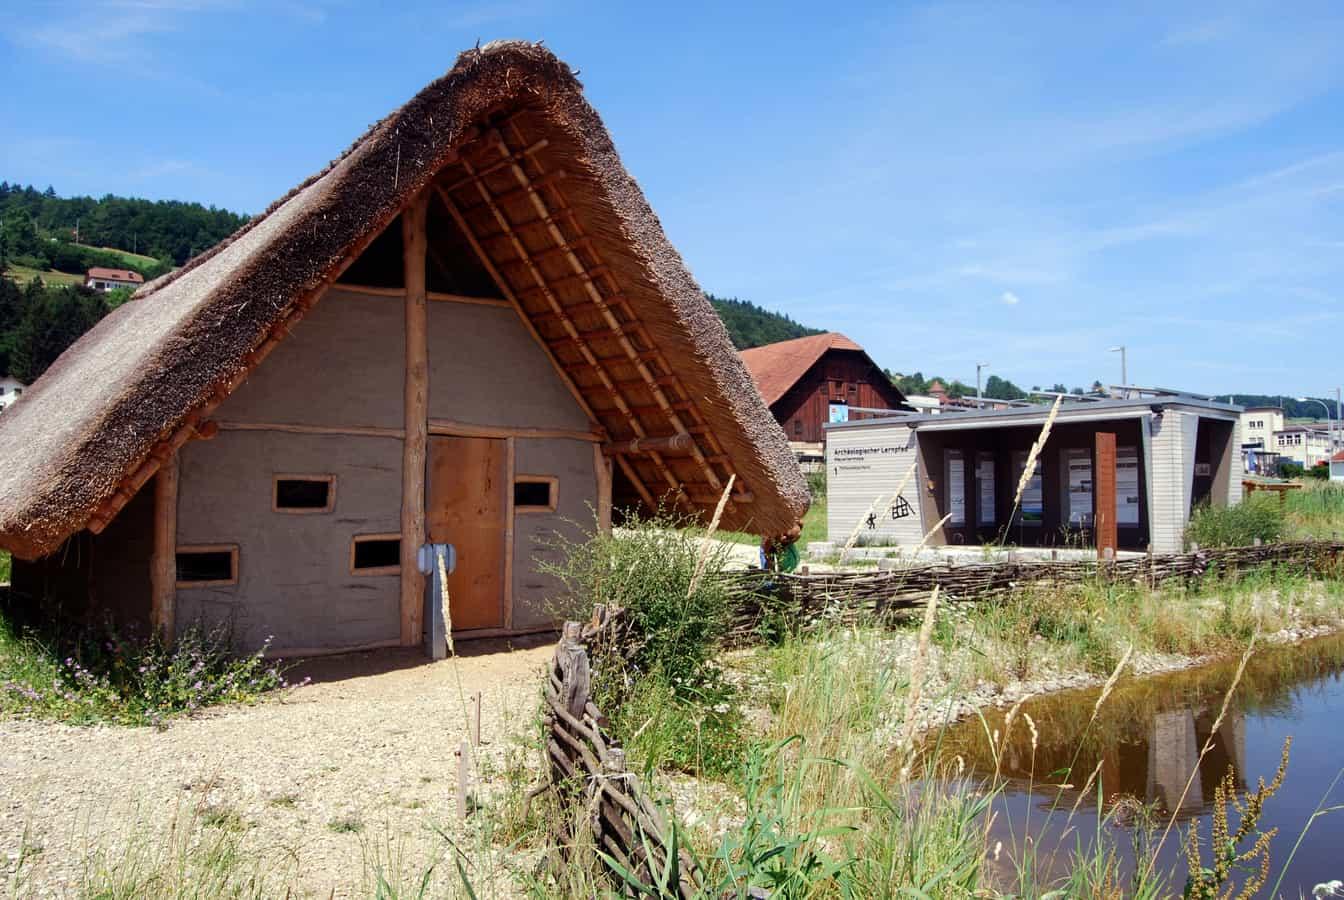 Archäologischer Lernpfad Wauwil